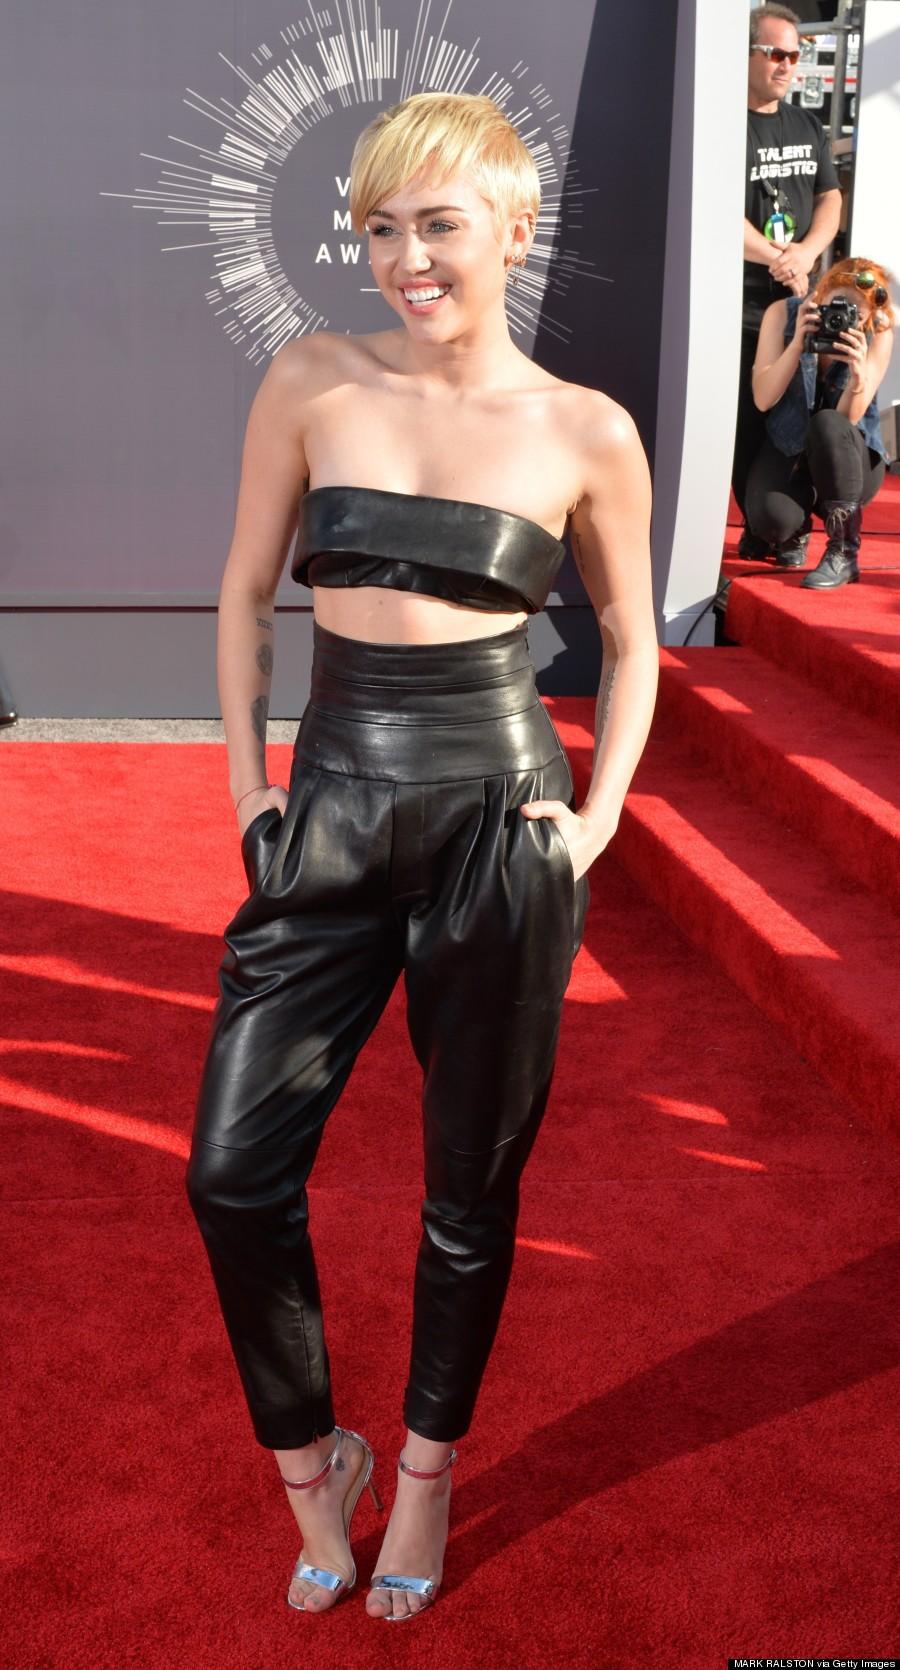 Miley Cyrus Wears Tiniest Top Ever At 2014 Mtv Vmas Photos